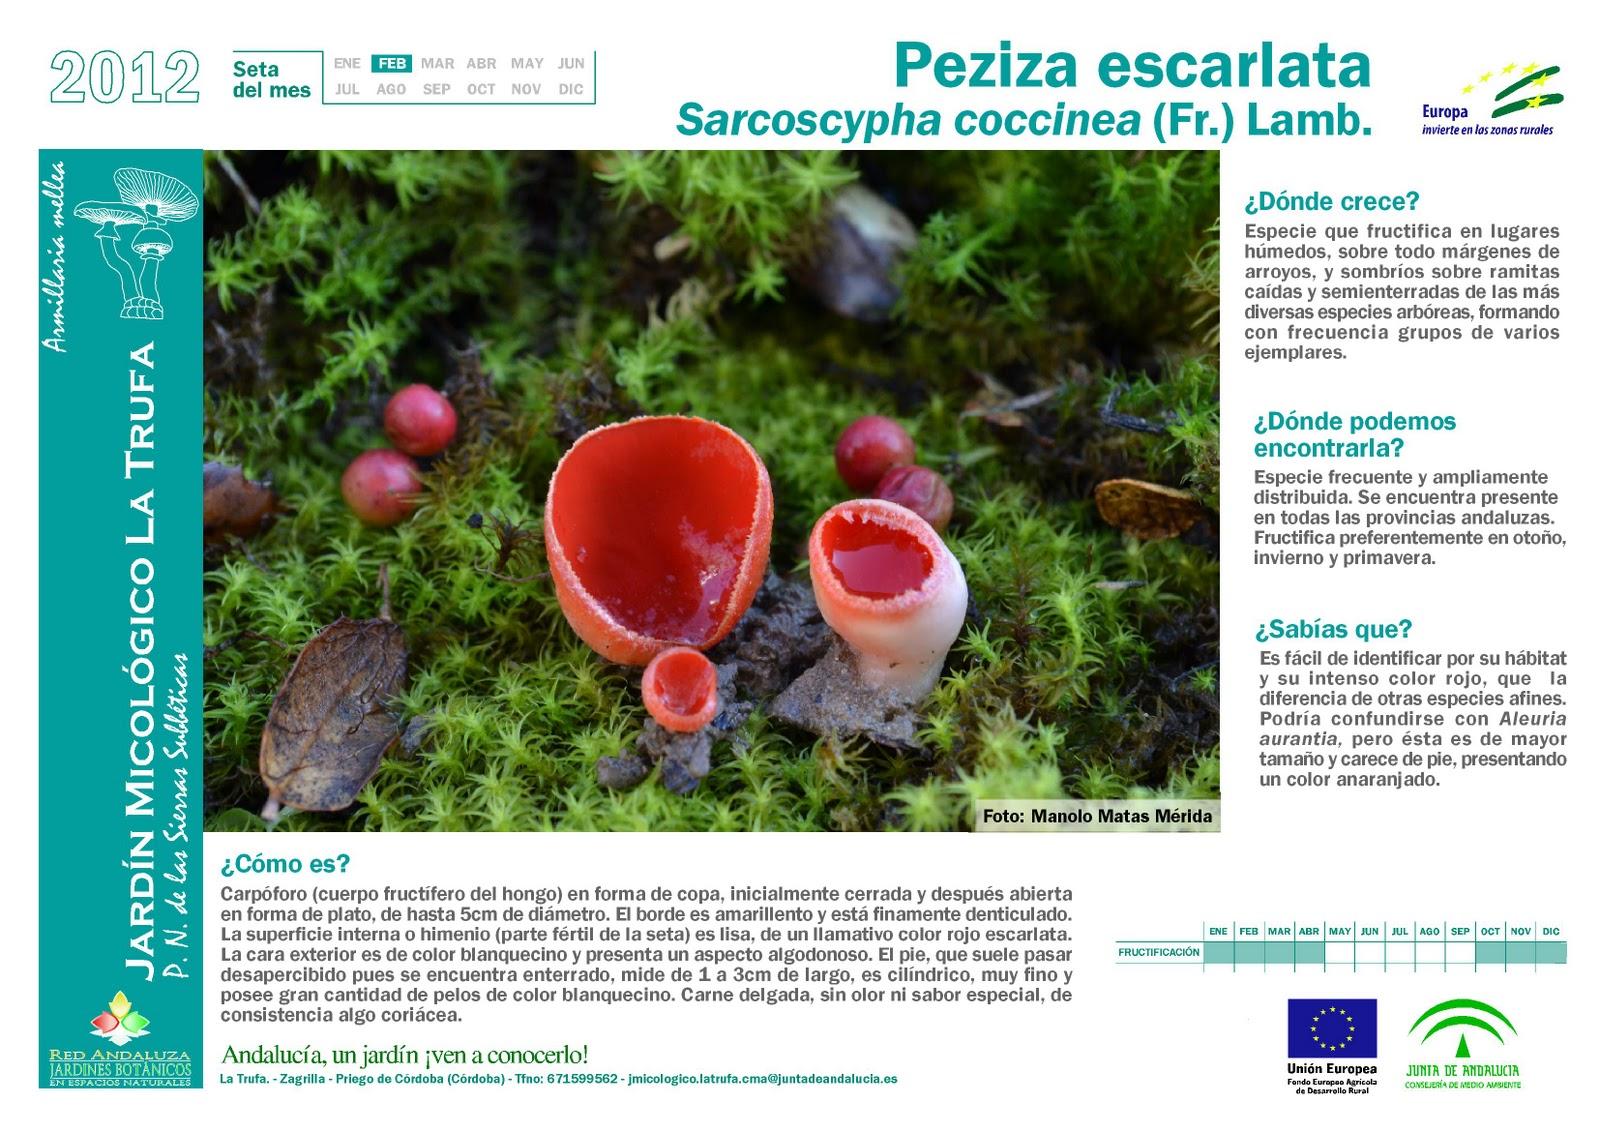 Sociedad micologica granadina seta del mes de febrero for Jardin micologico la trufa